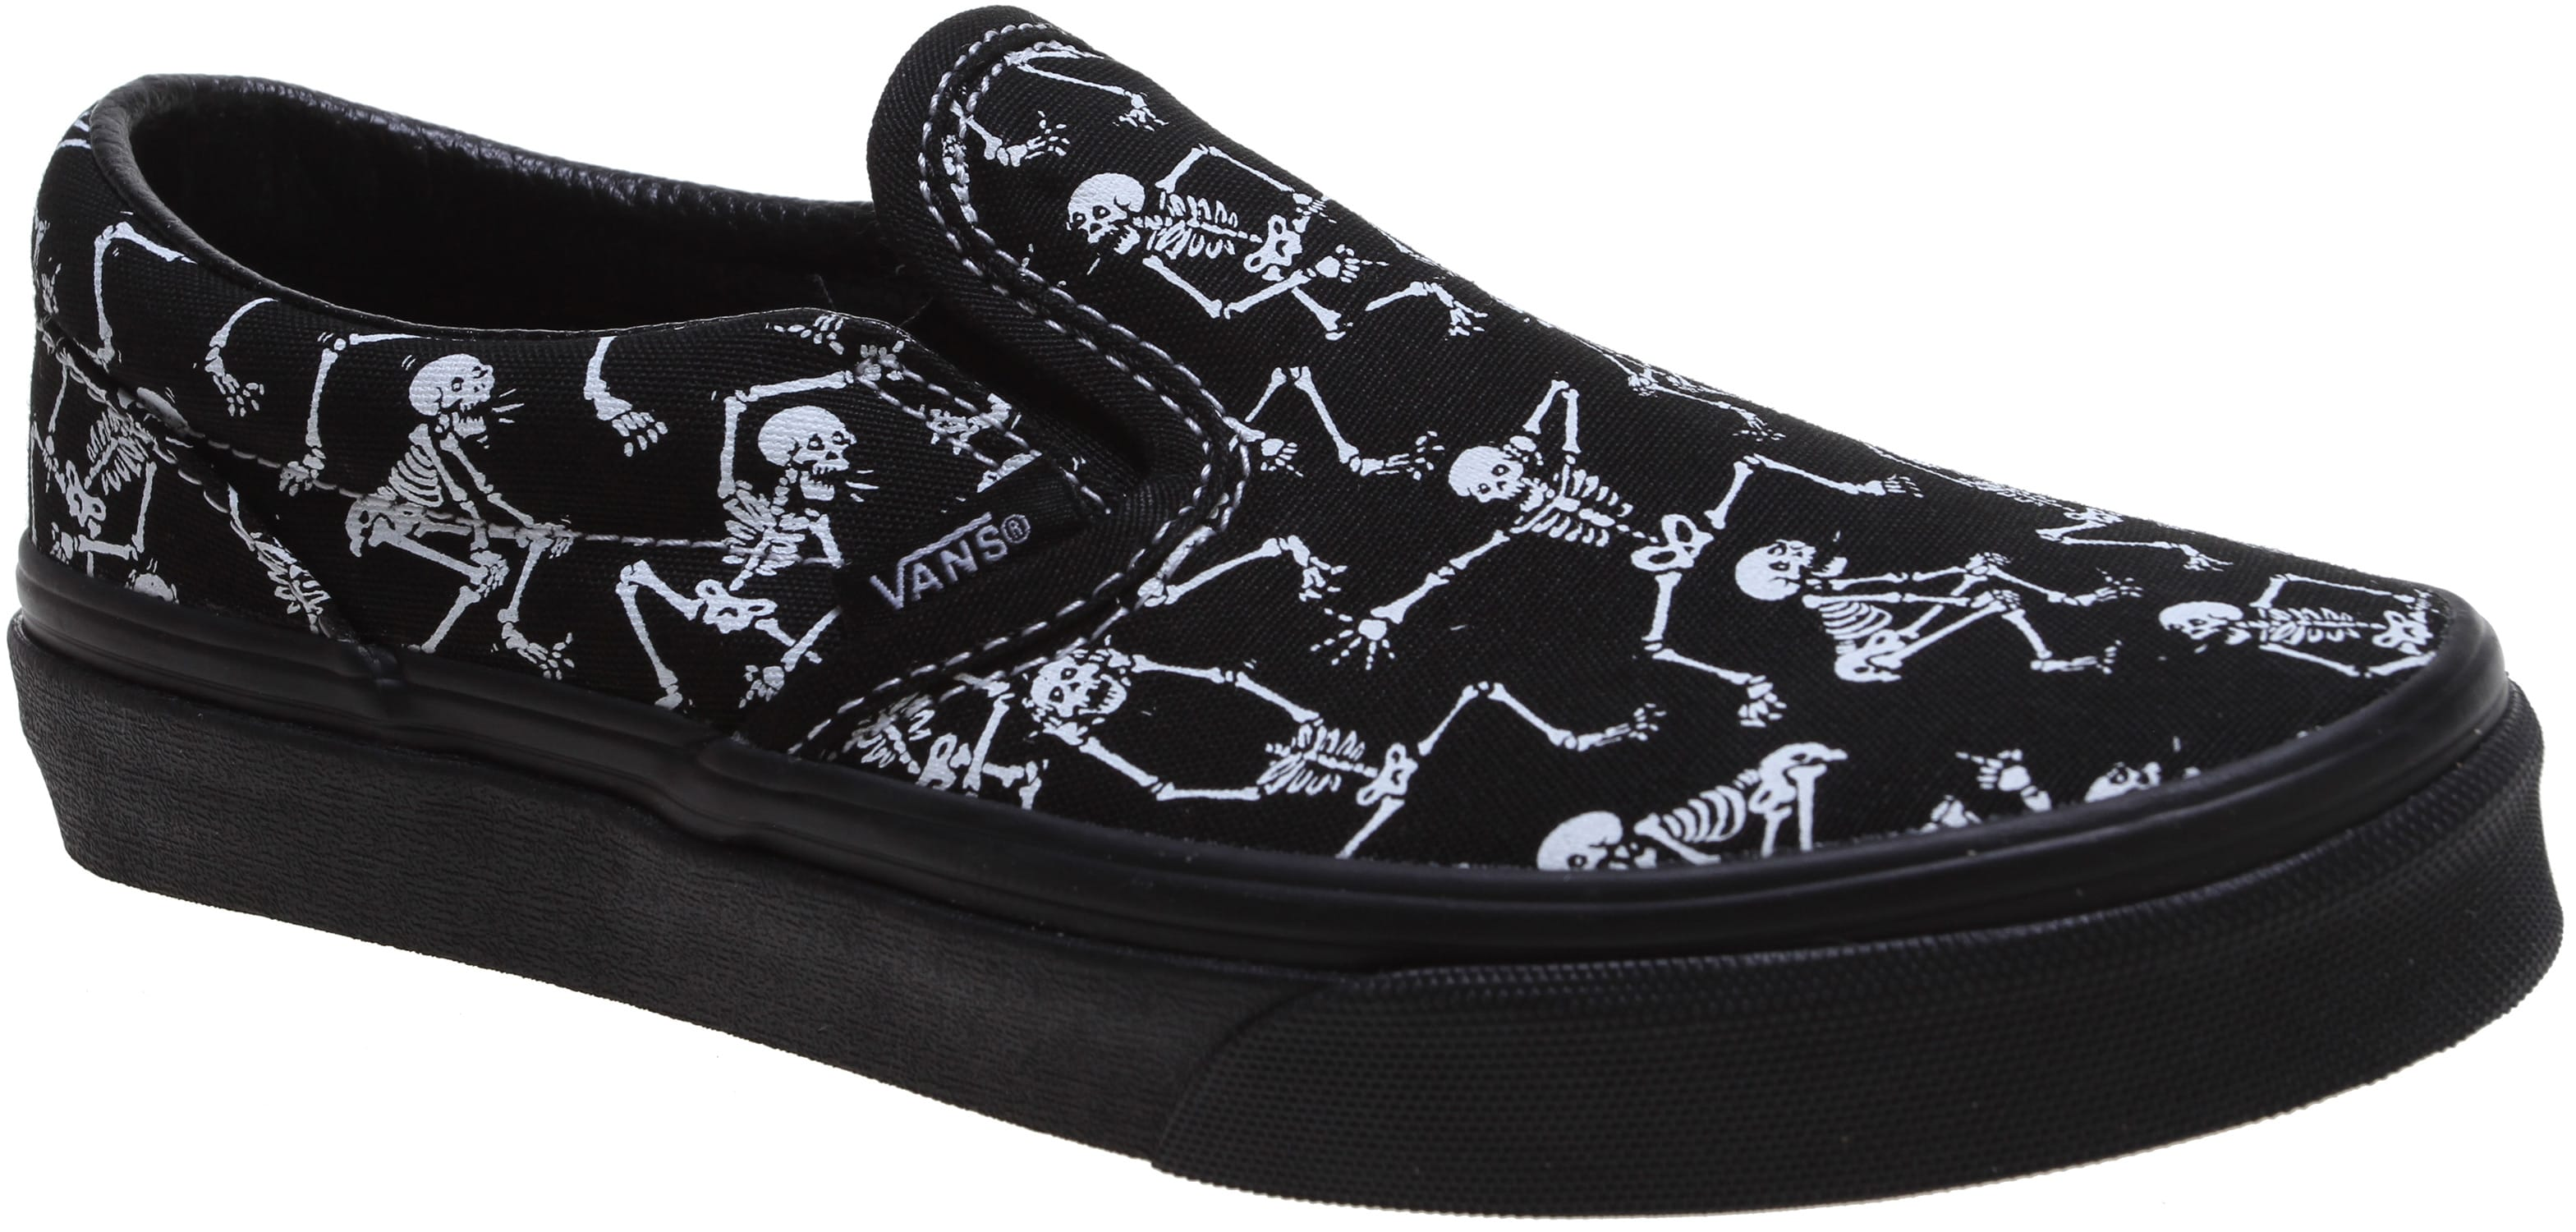 c4f1e897157c55 Vans Classic Slip-On (Bone Dance) Skate Shoes - thumbnail 2